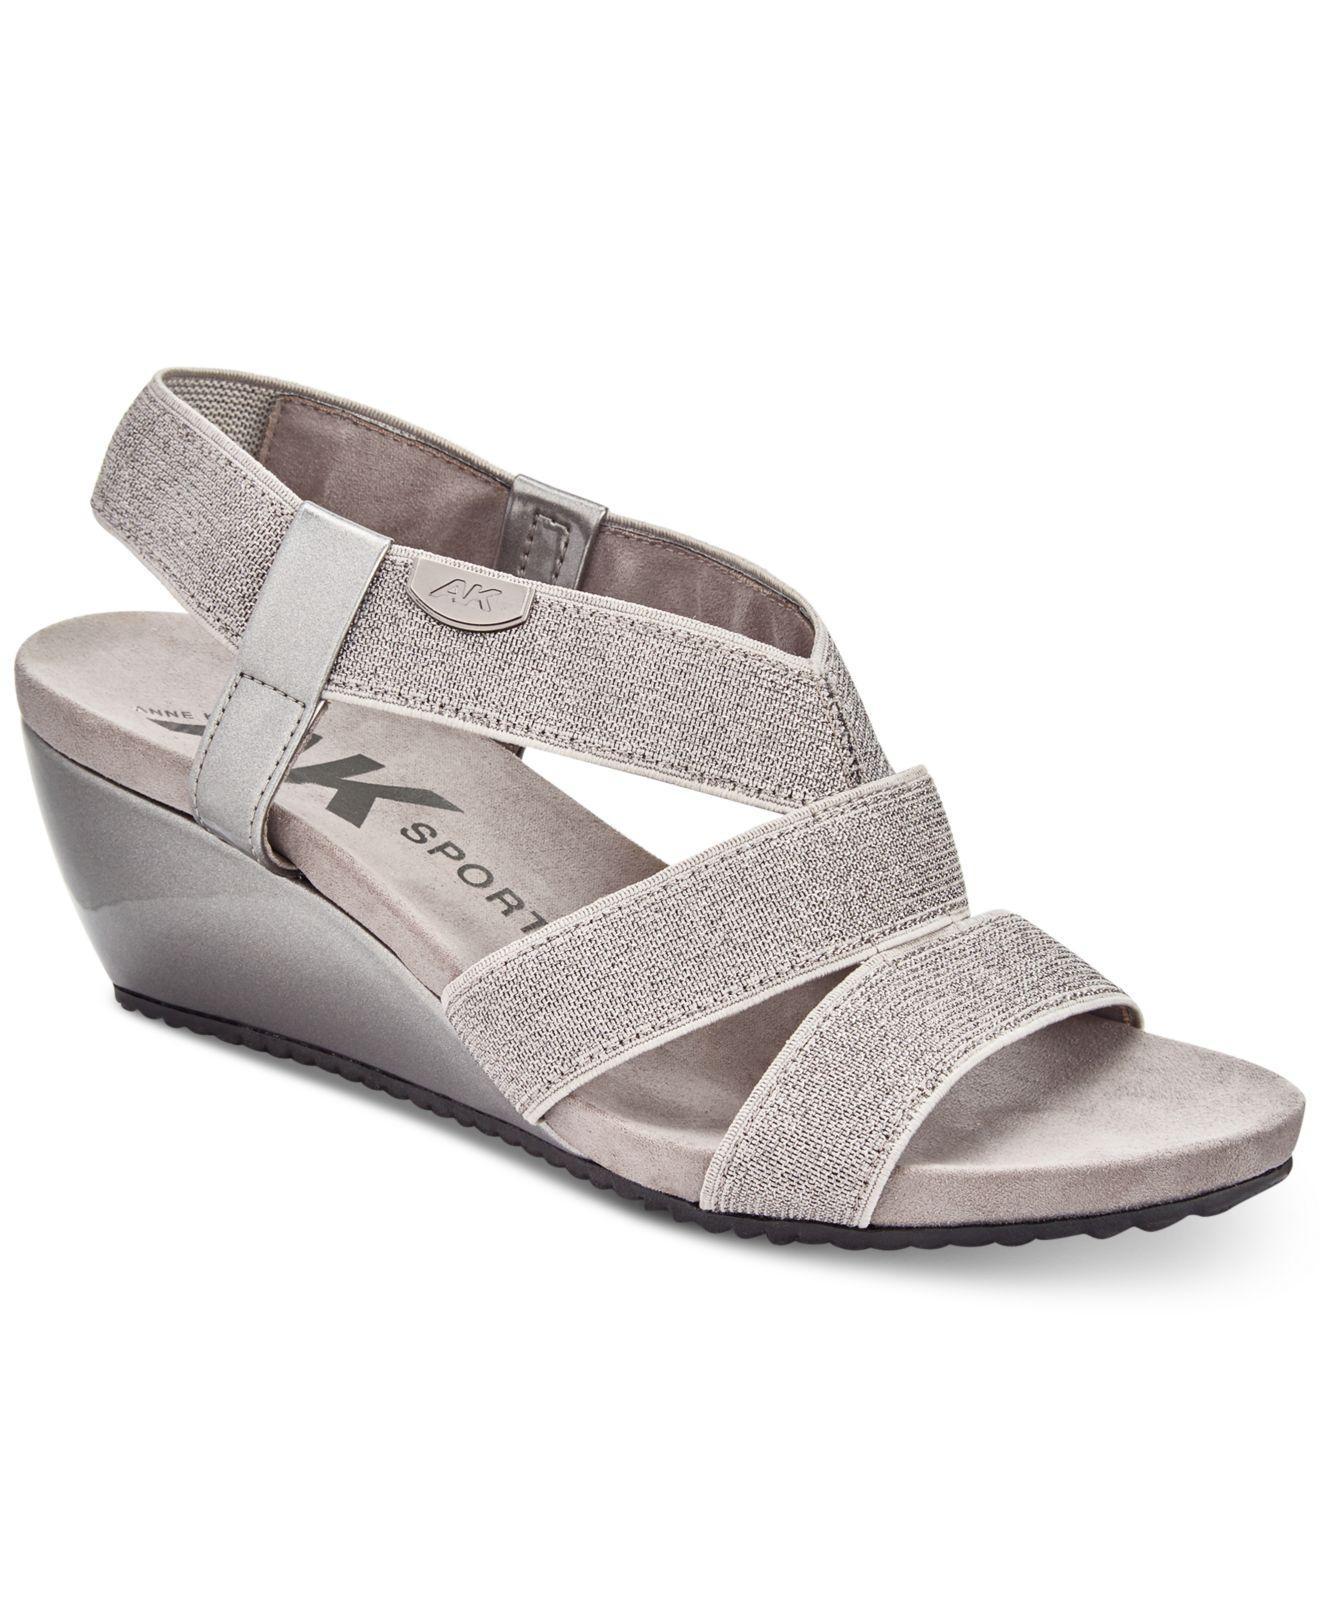 8a812181035 Lyst anne klein sport cabrini wedge sandals jpg 1320x1616 Siesta wedge anne  klein sport sandals